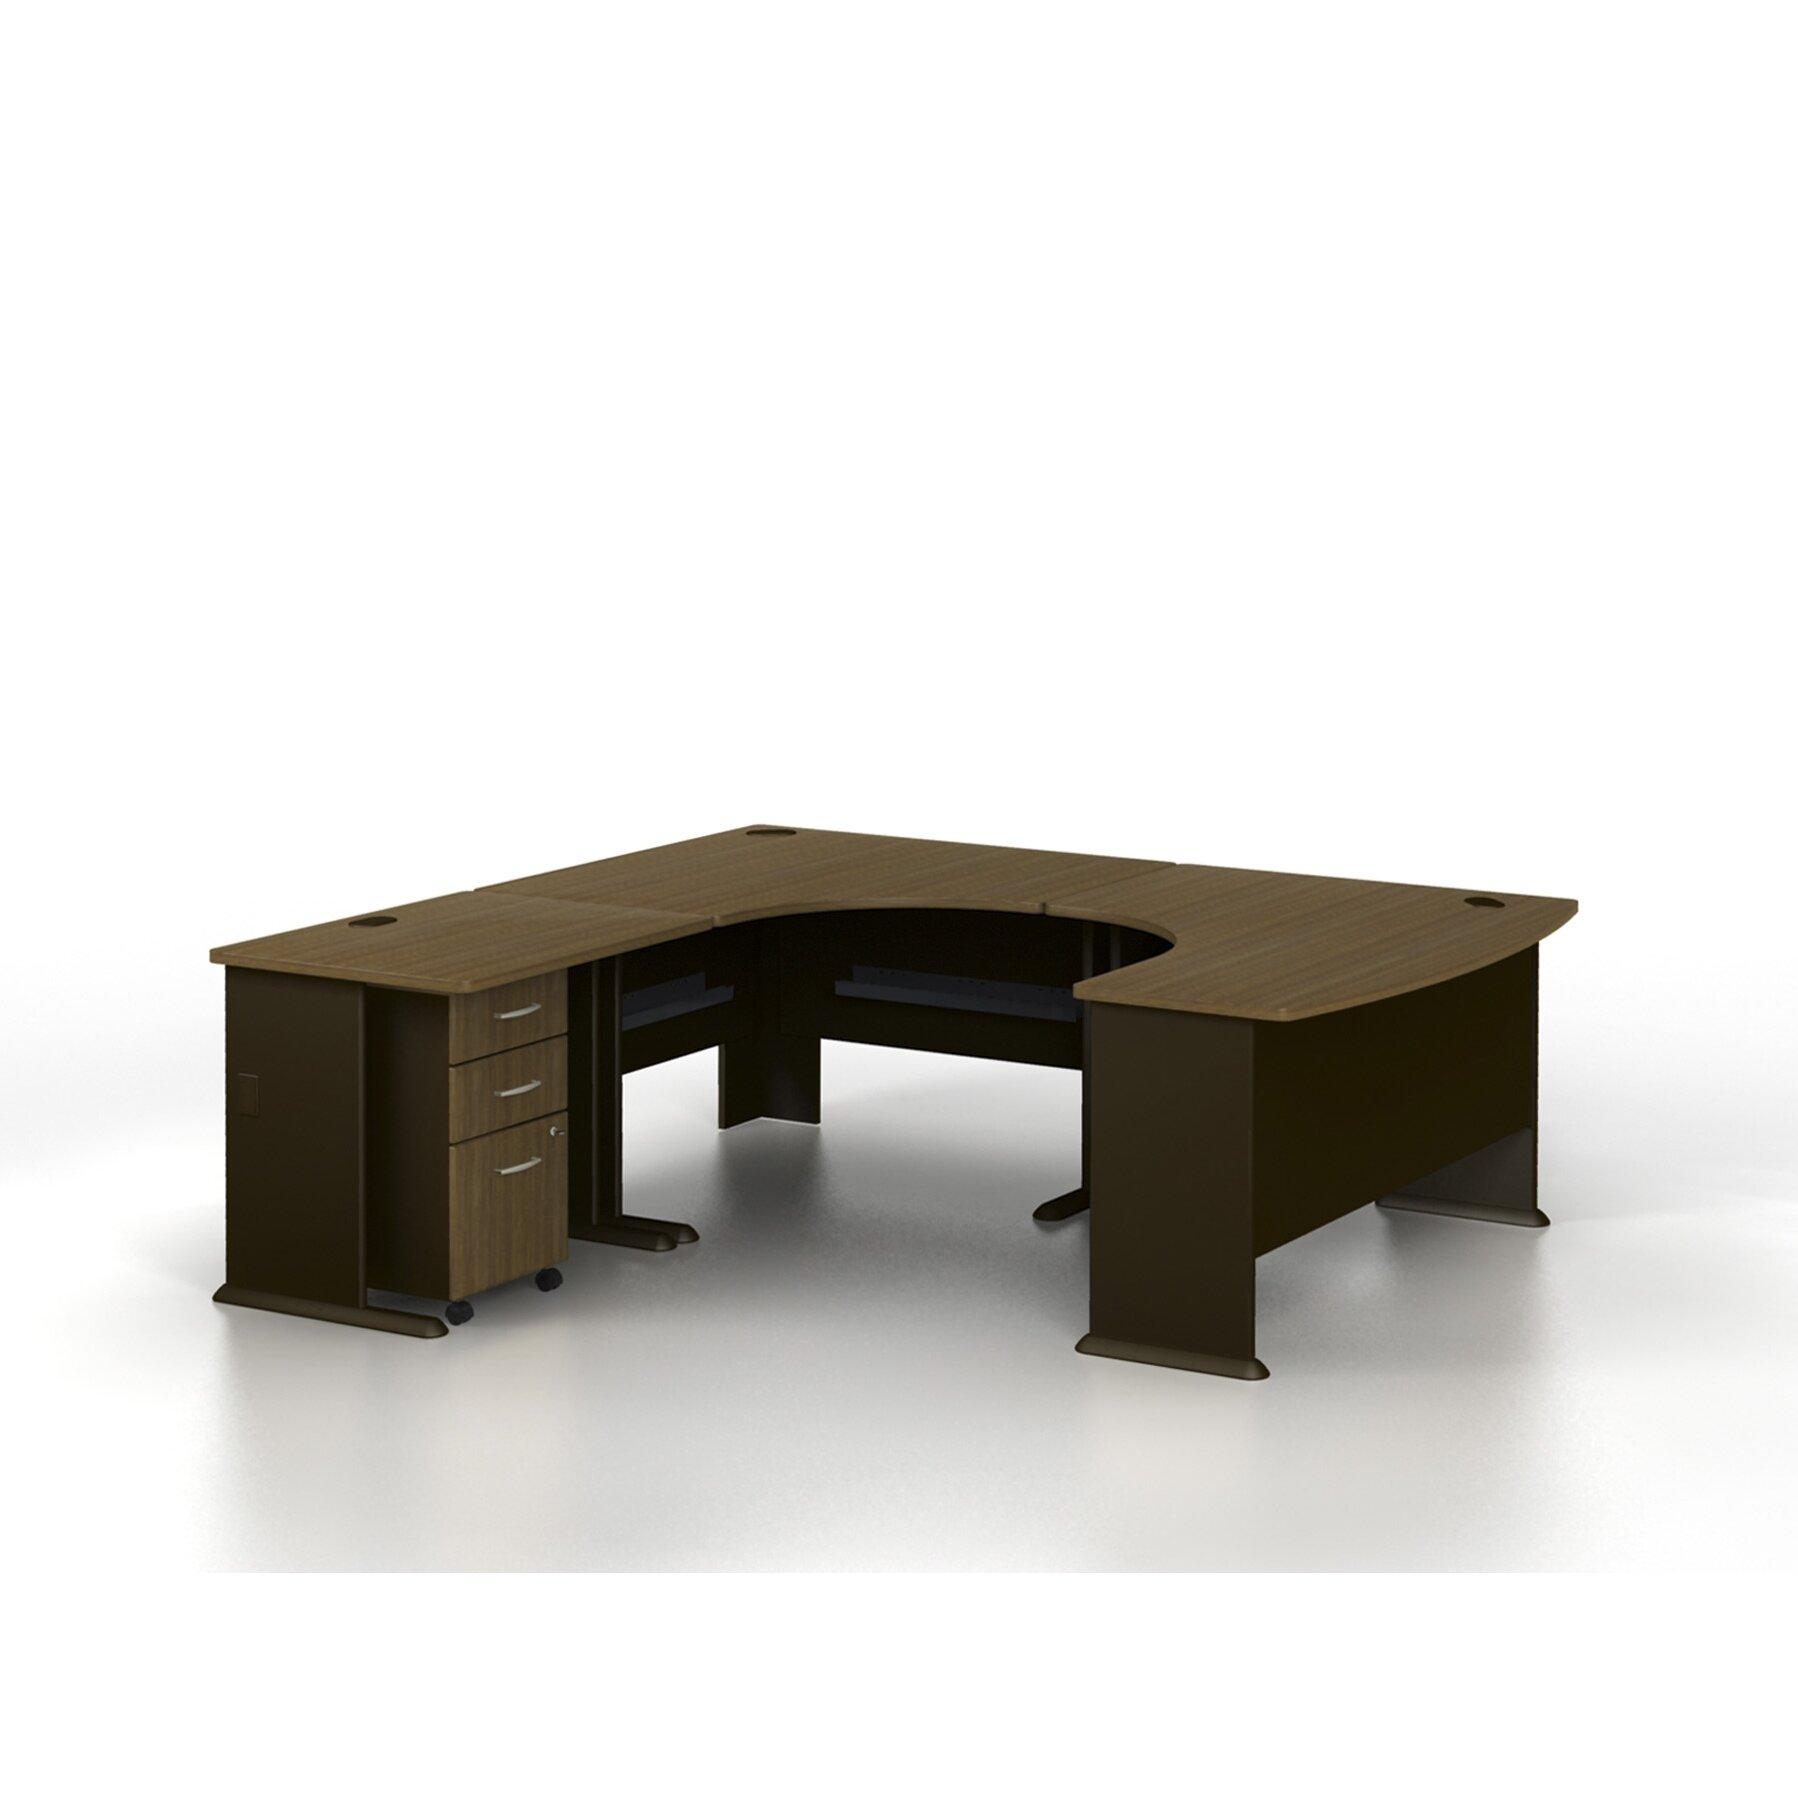 King Size Bedroom Suites For Sale Bush Business Furniture Series A U Shape Desk Office Suite